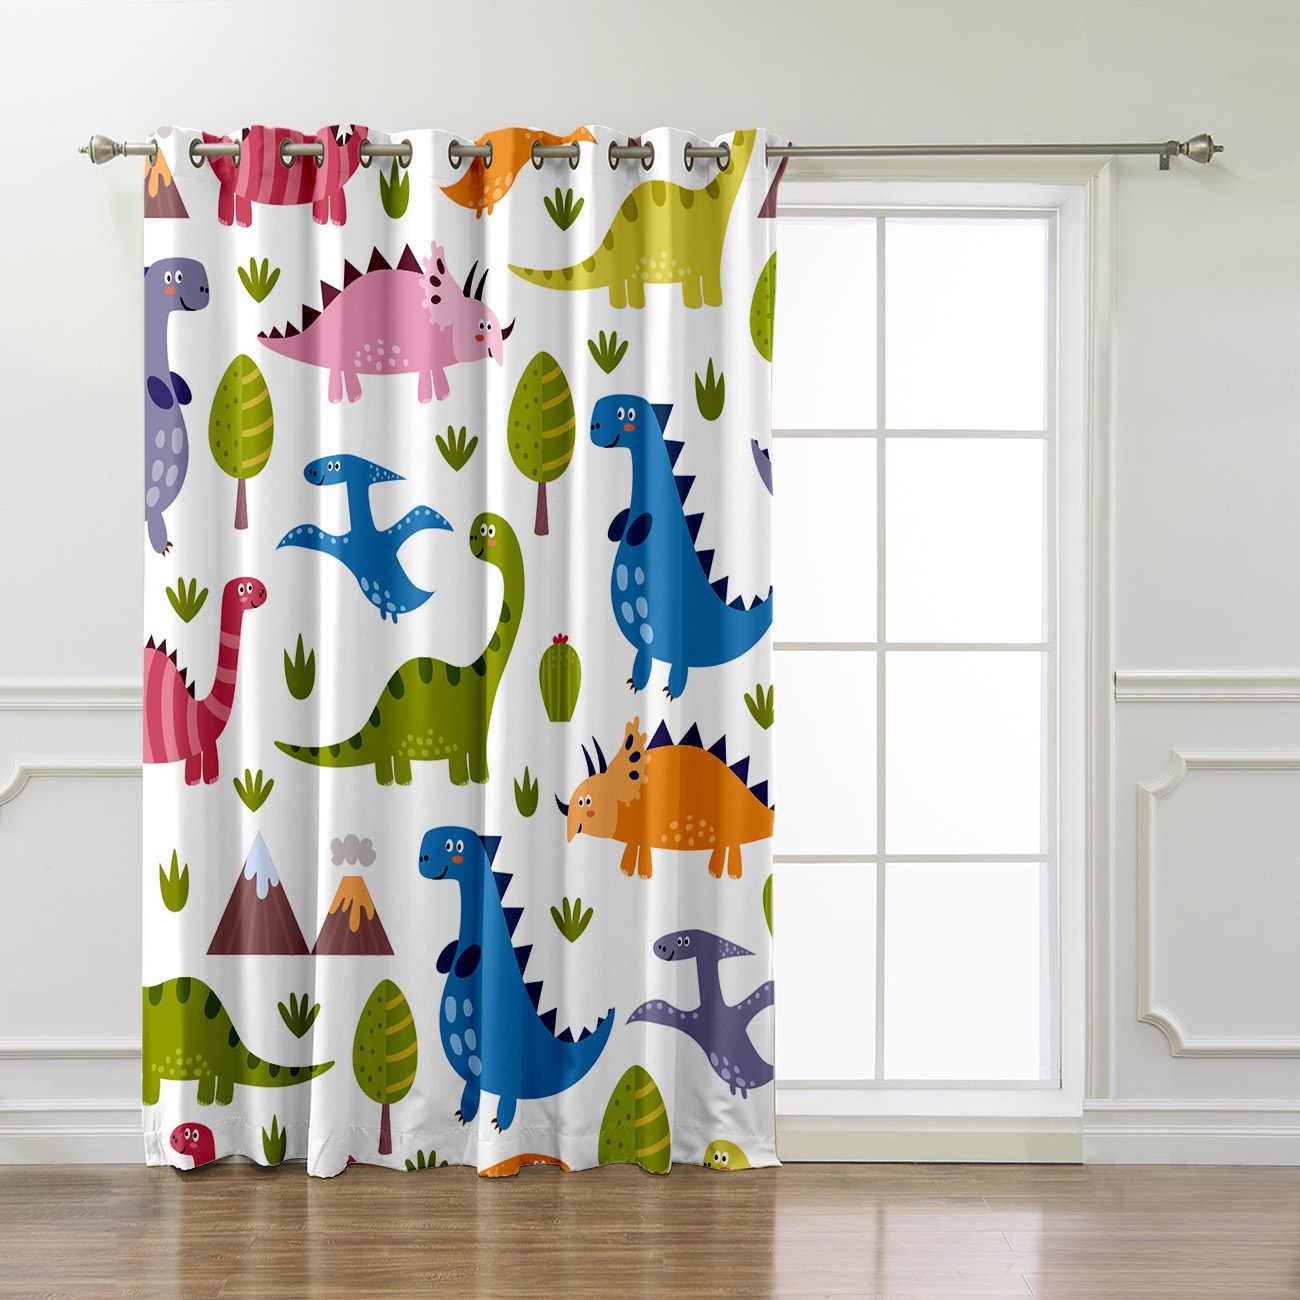 Lovely Dinosaur Patterns Room Curtains Large Window Curtain Lights